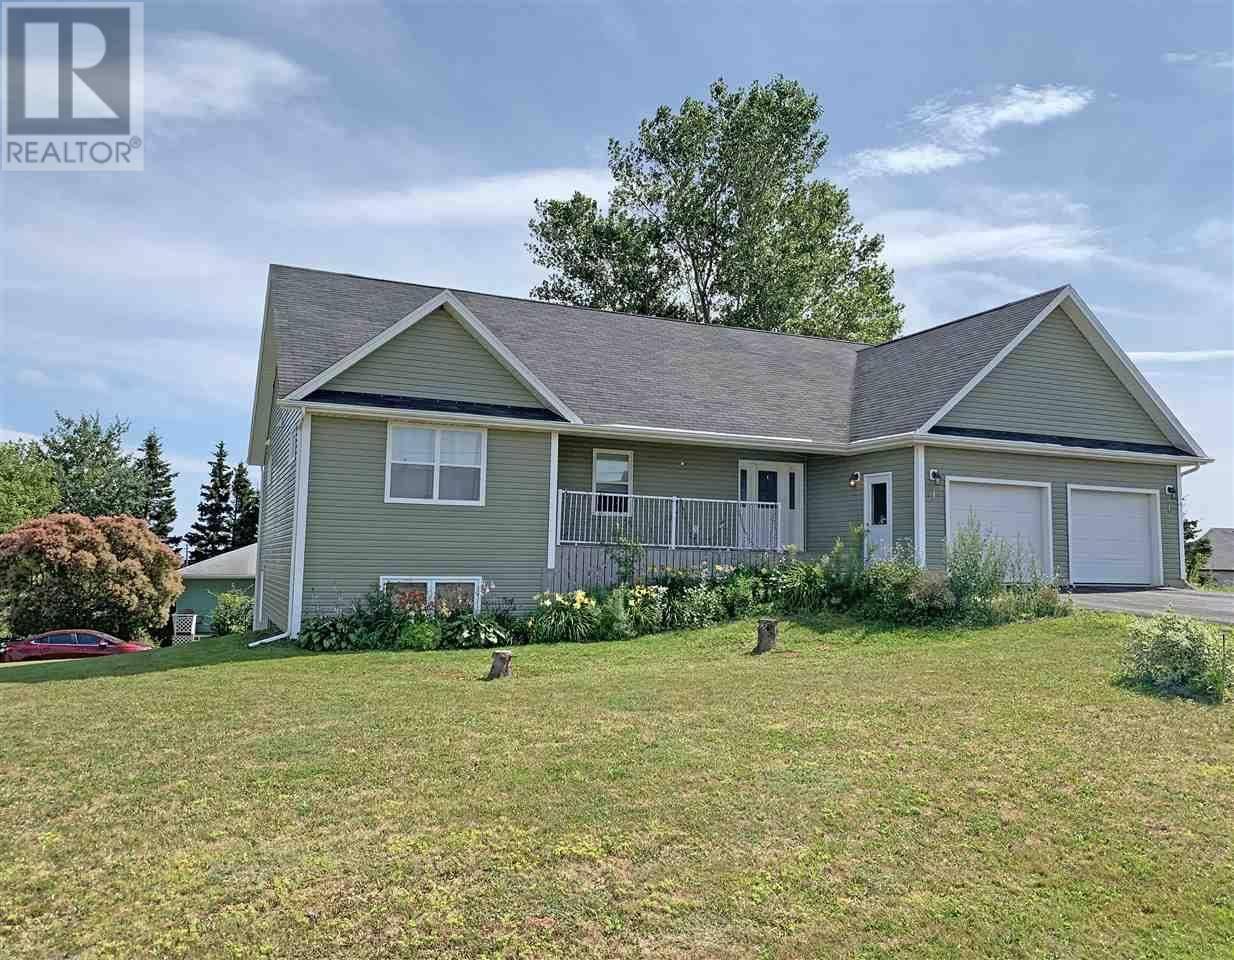 House for sale at 3 Stonington Blvd Stratford Prince Edward Island - MLS: 201902552